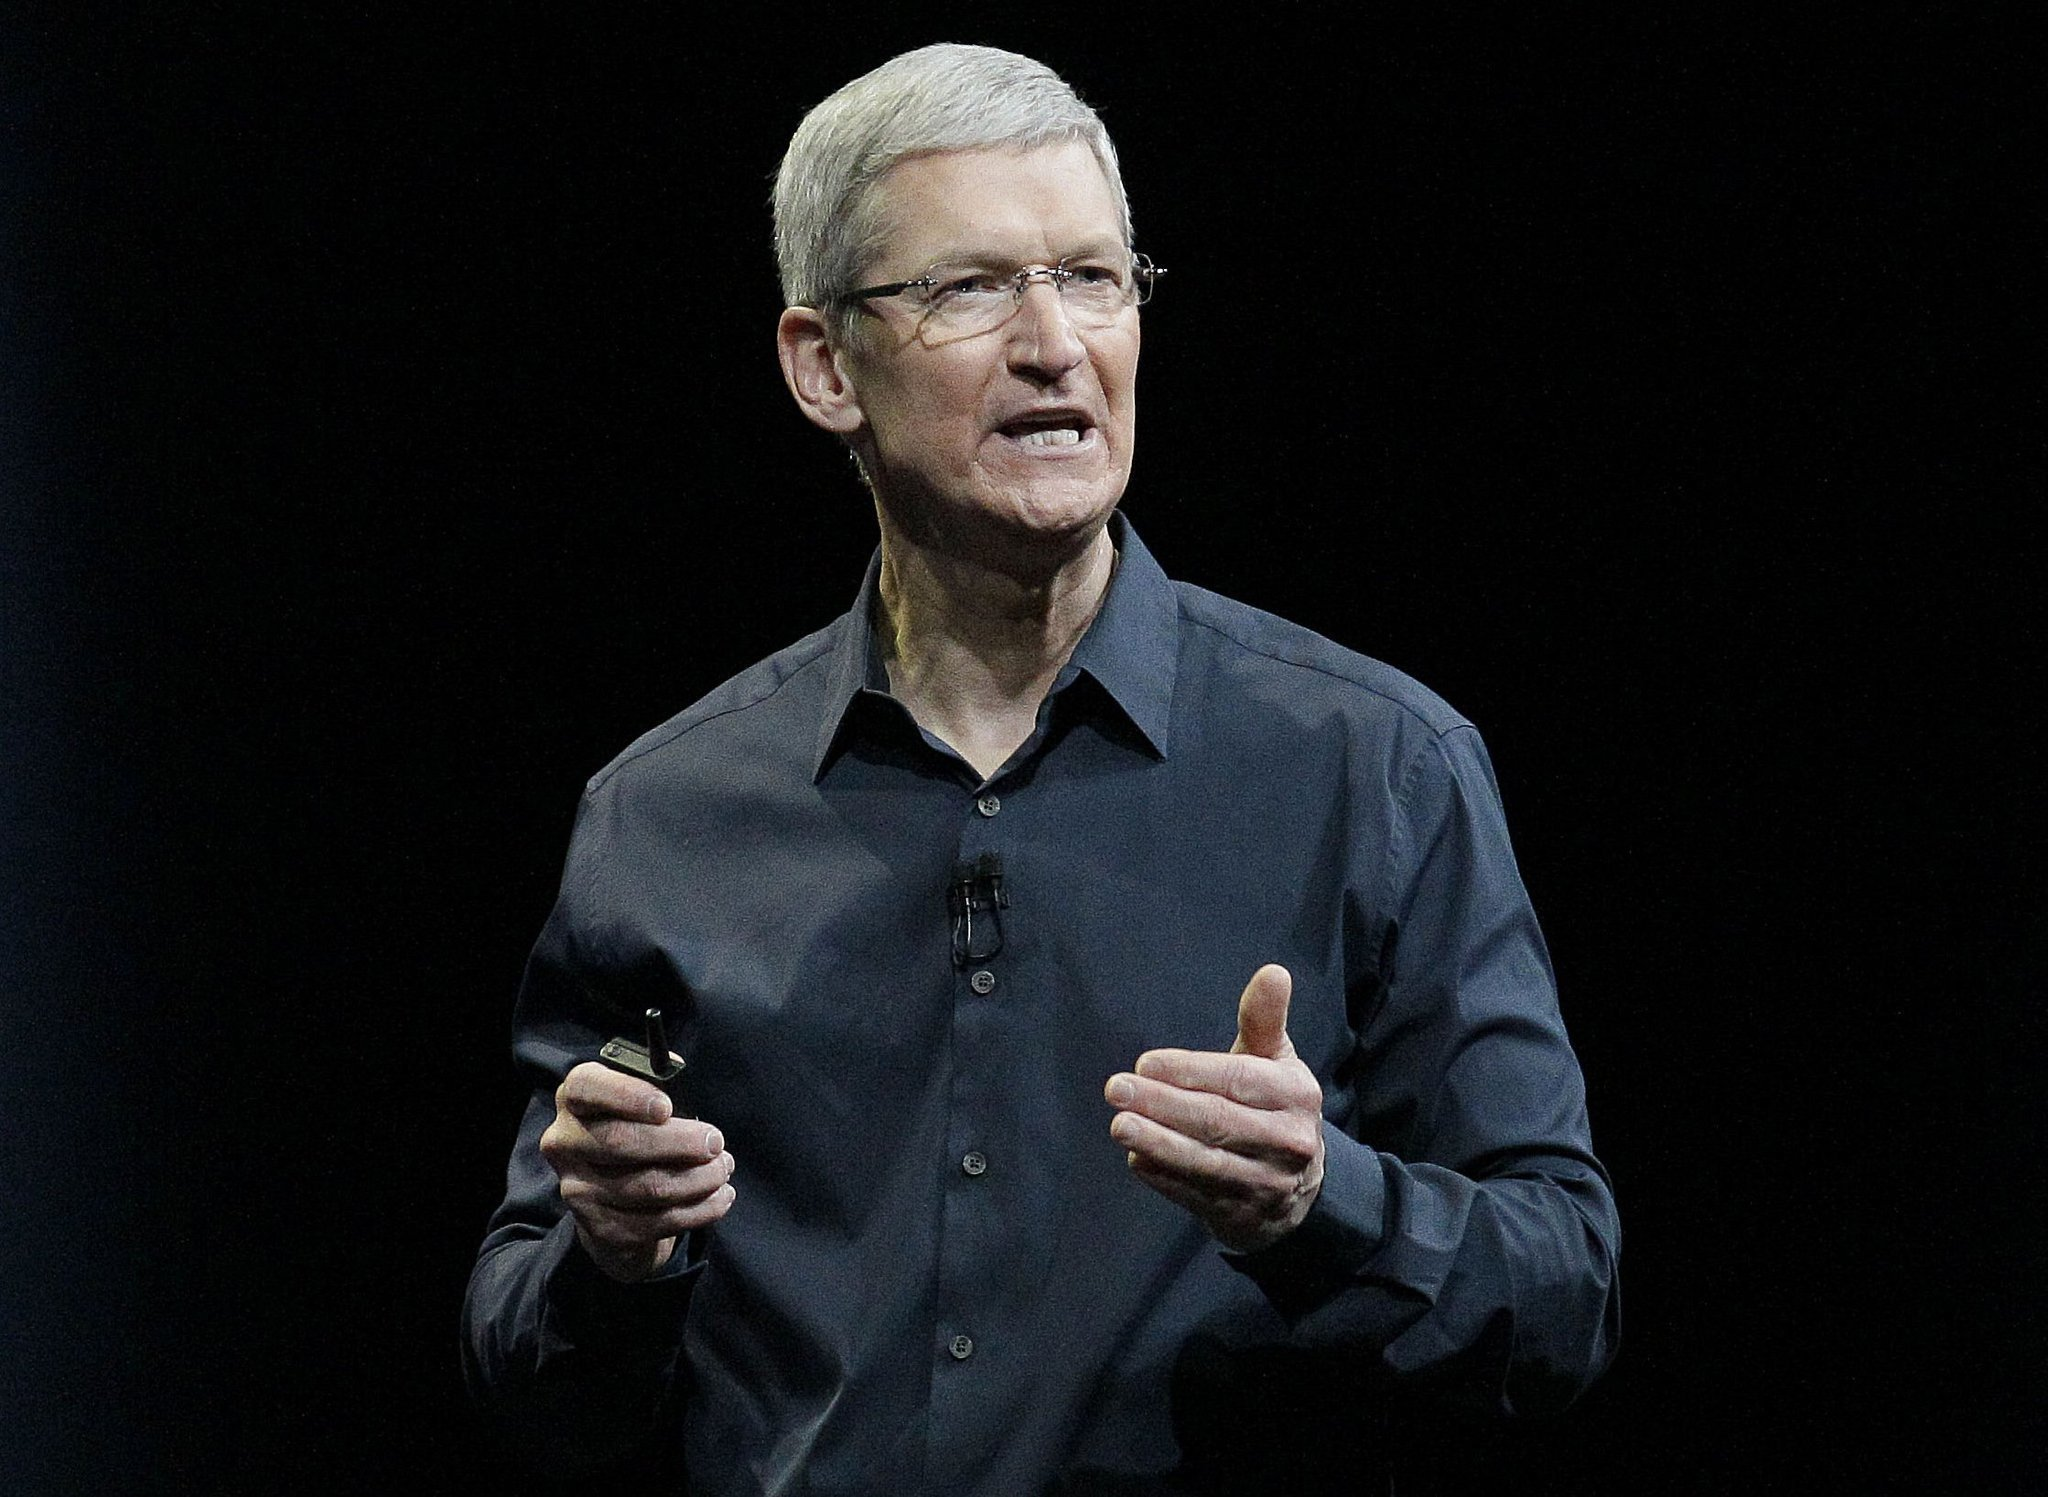 Apple's Tim Cook denounces 'religious freedom' proposals